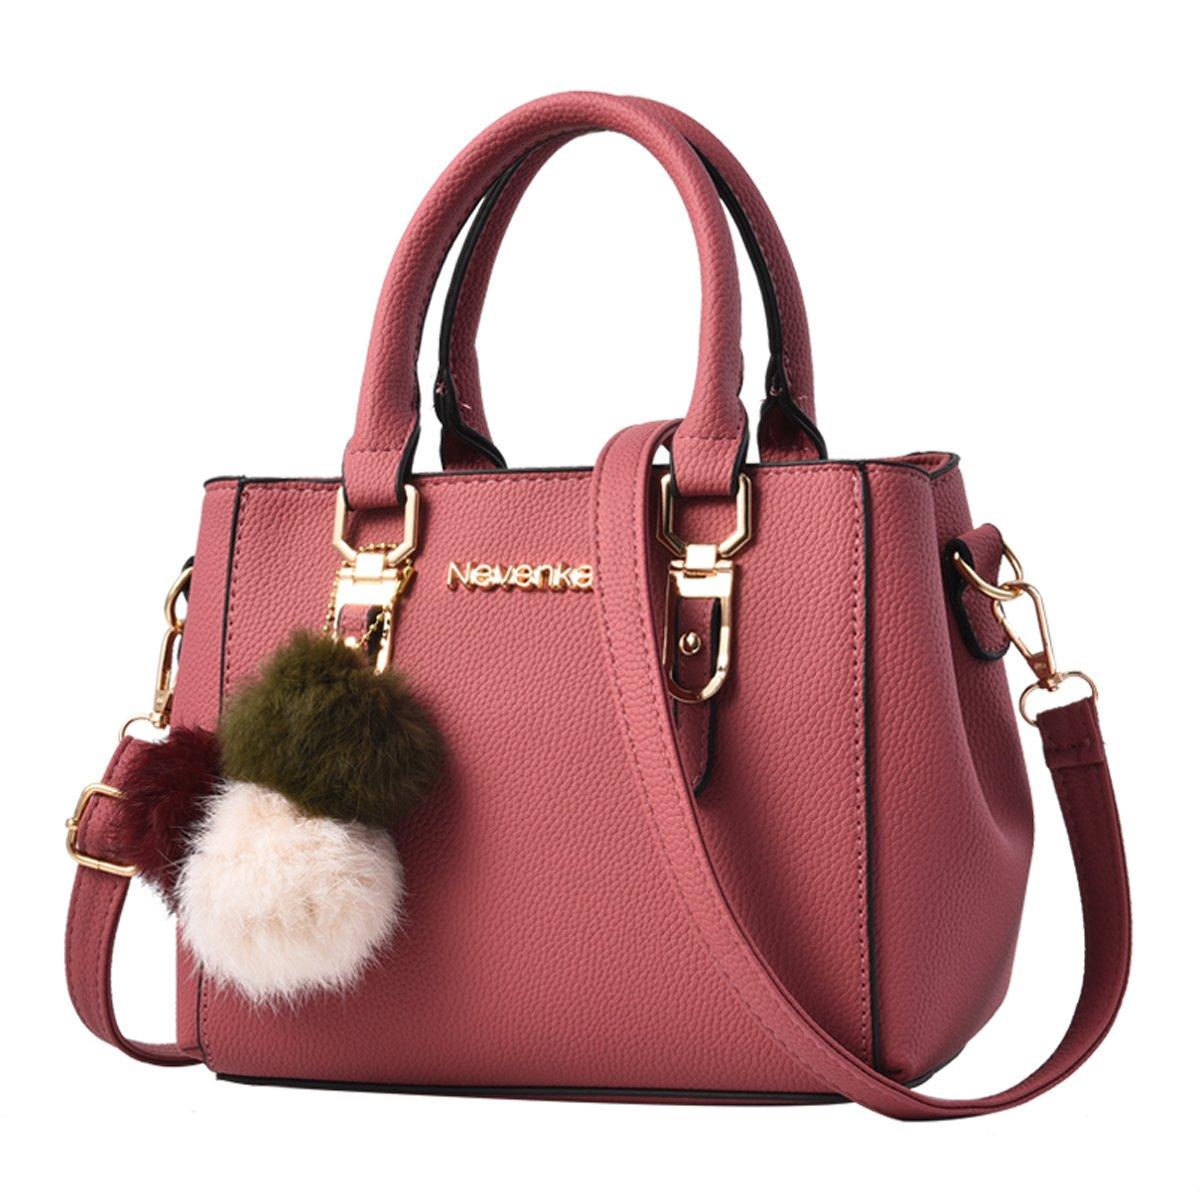 cb74a9ef90ee52 Details about Nevenka Women Bags Handbag Shoulder Bags PU Leather Zipper  Bags Casual Purse Cro